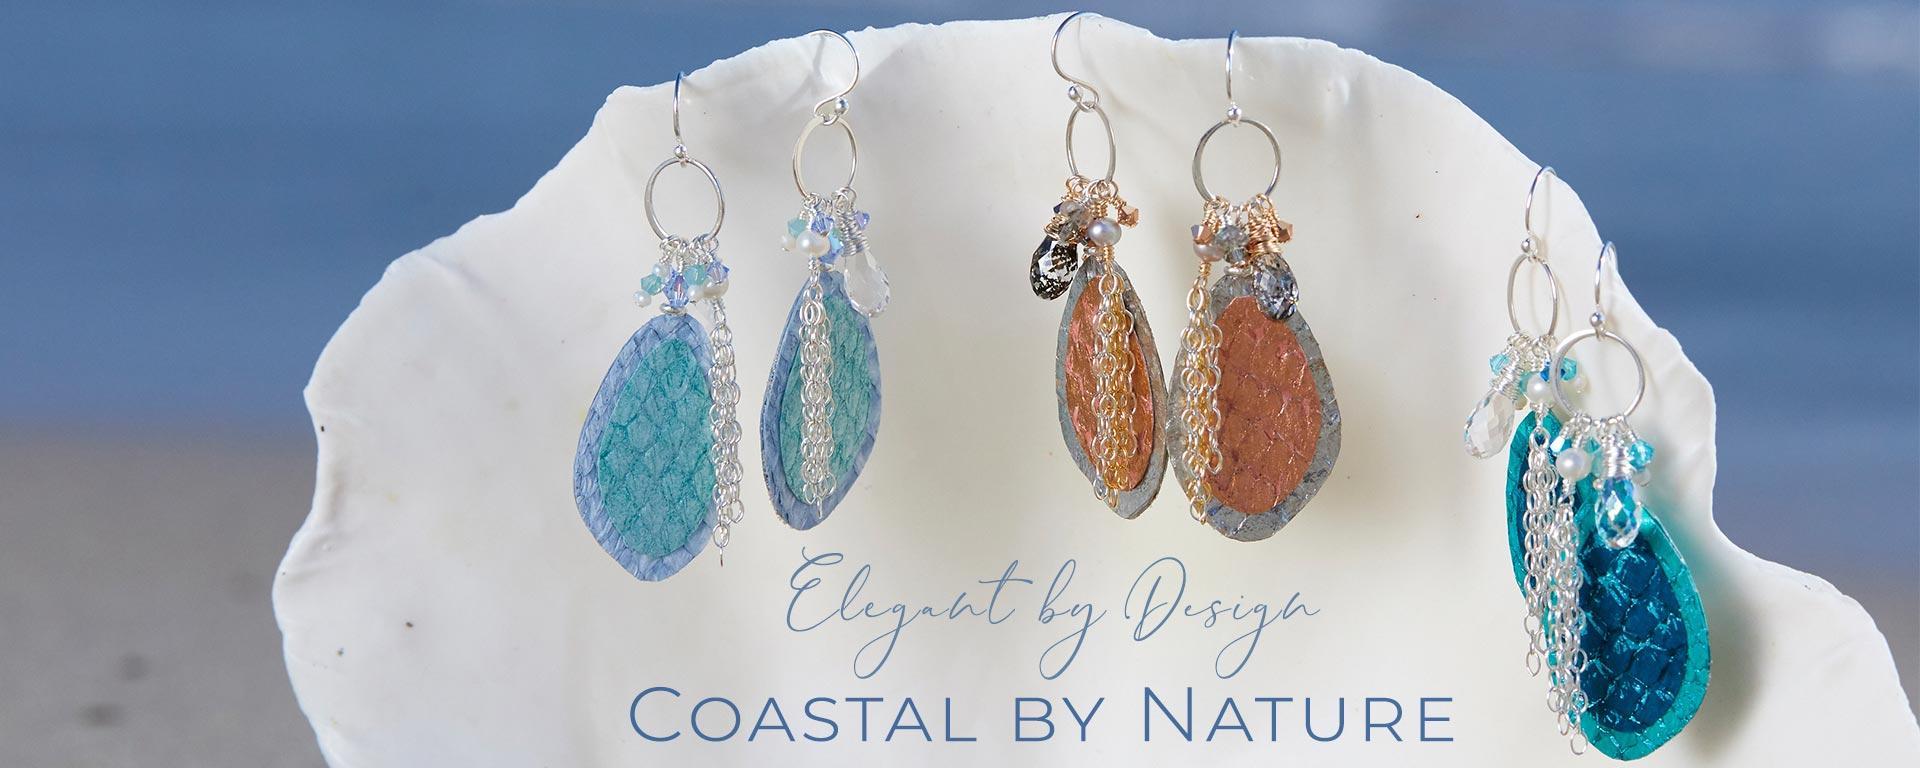 Elegant by Design. Coastal by Nature.